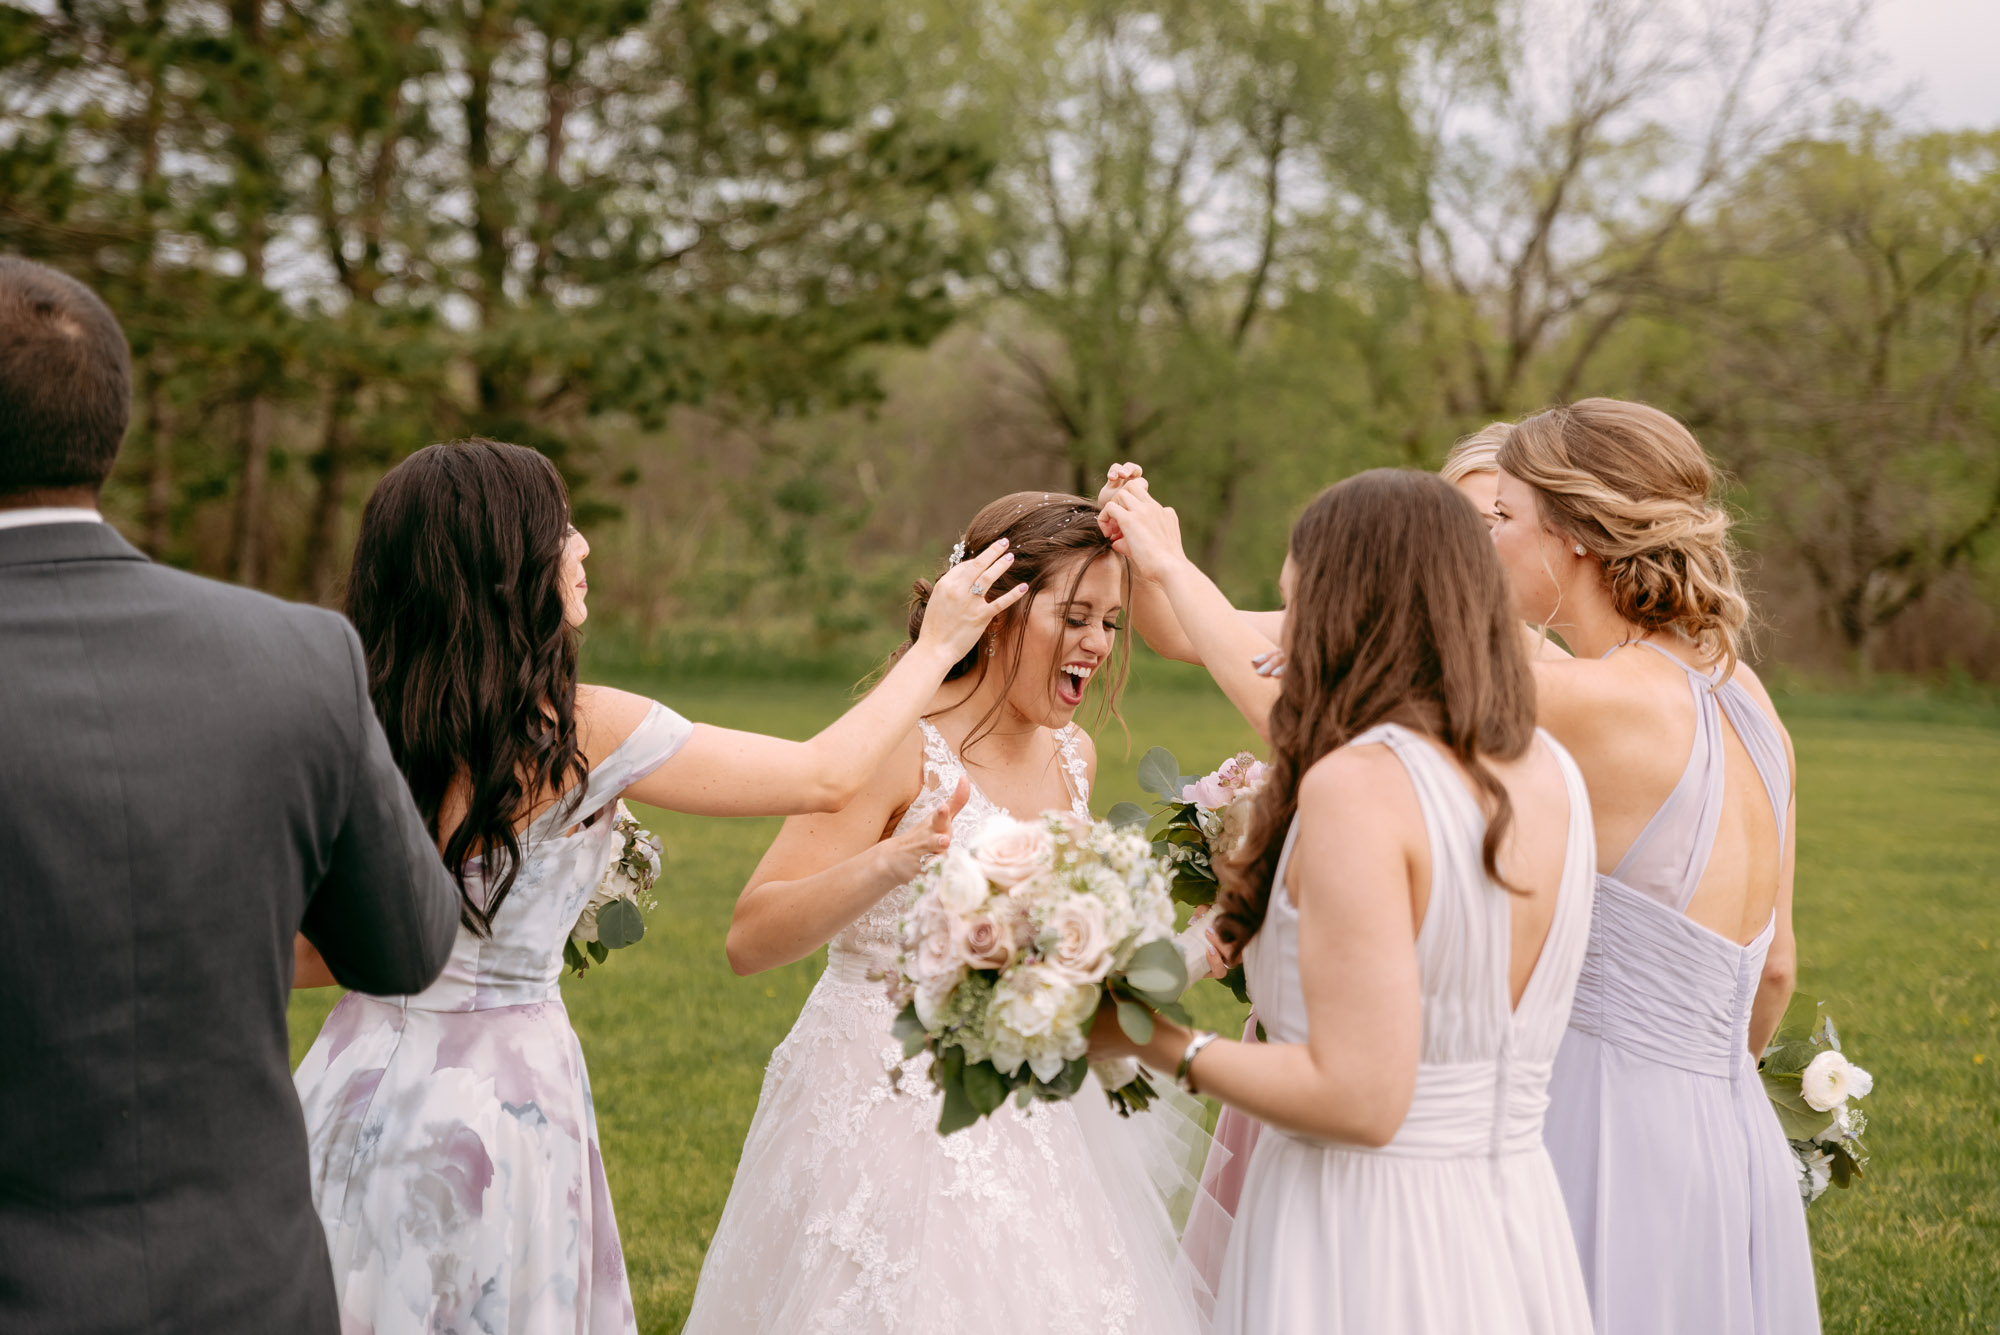 orchard-farms-pavillion-wedding-rockton-IL-wedding-photographers-293.jpg